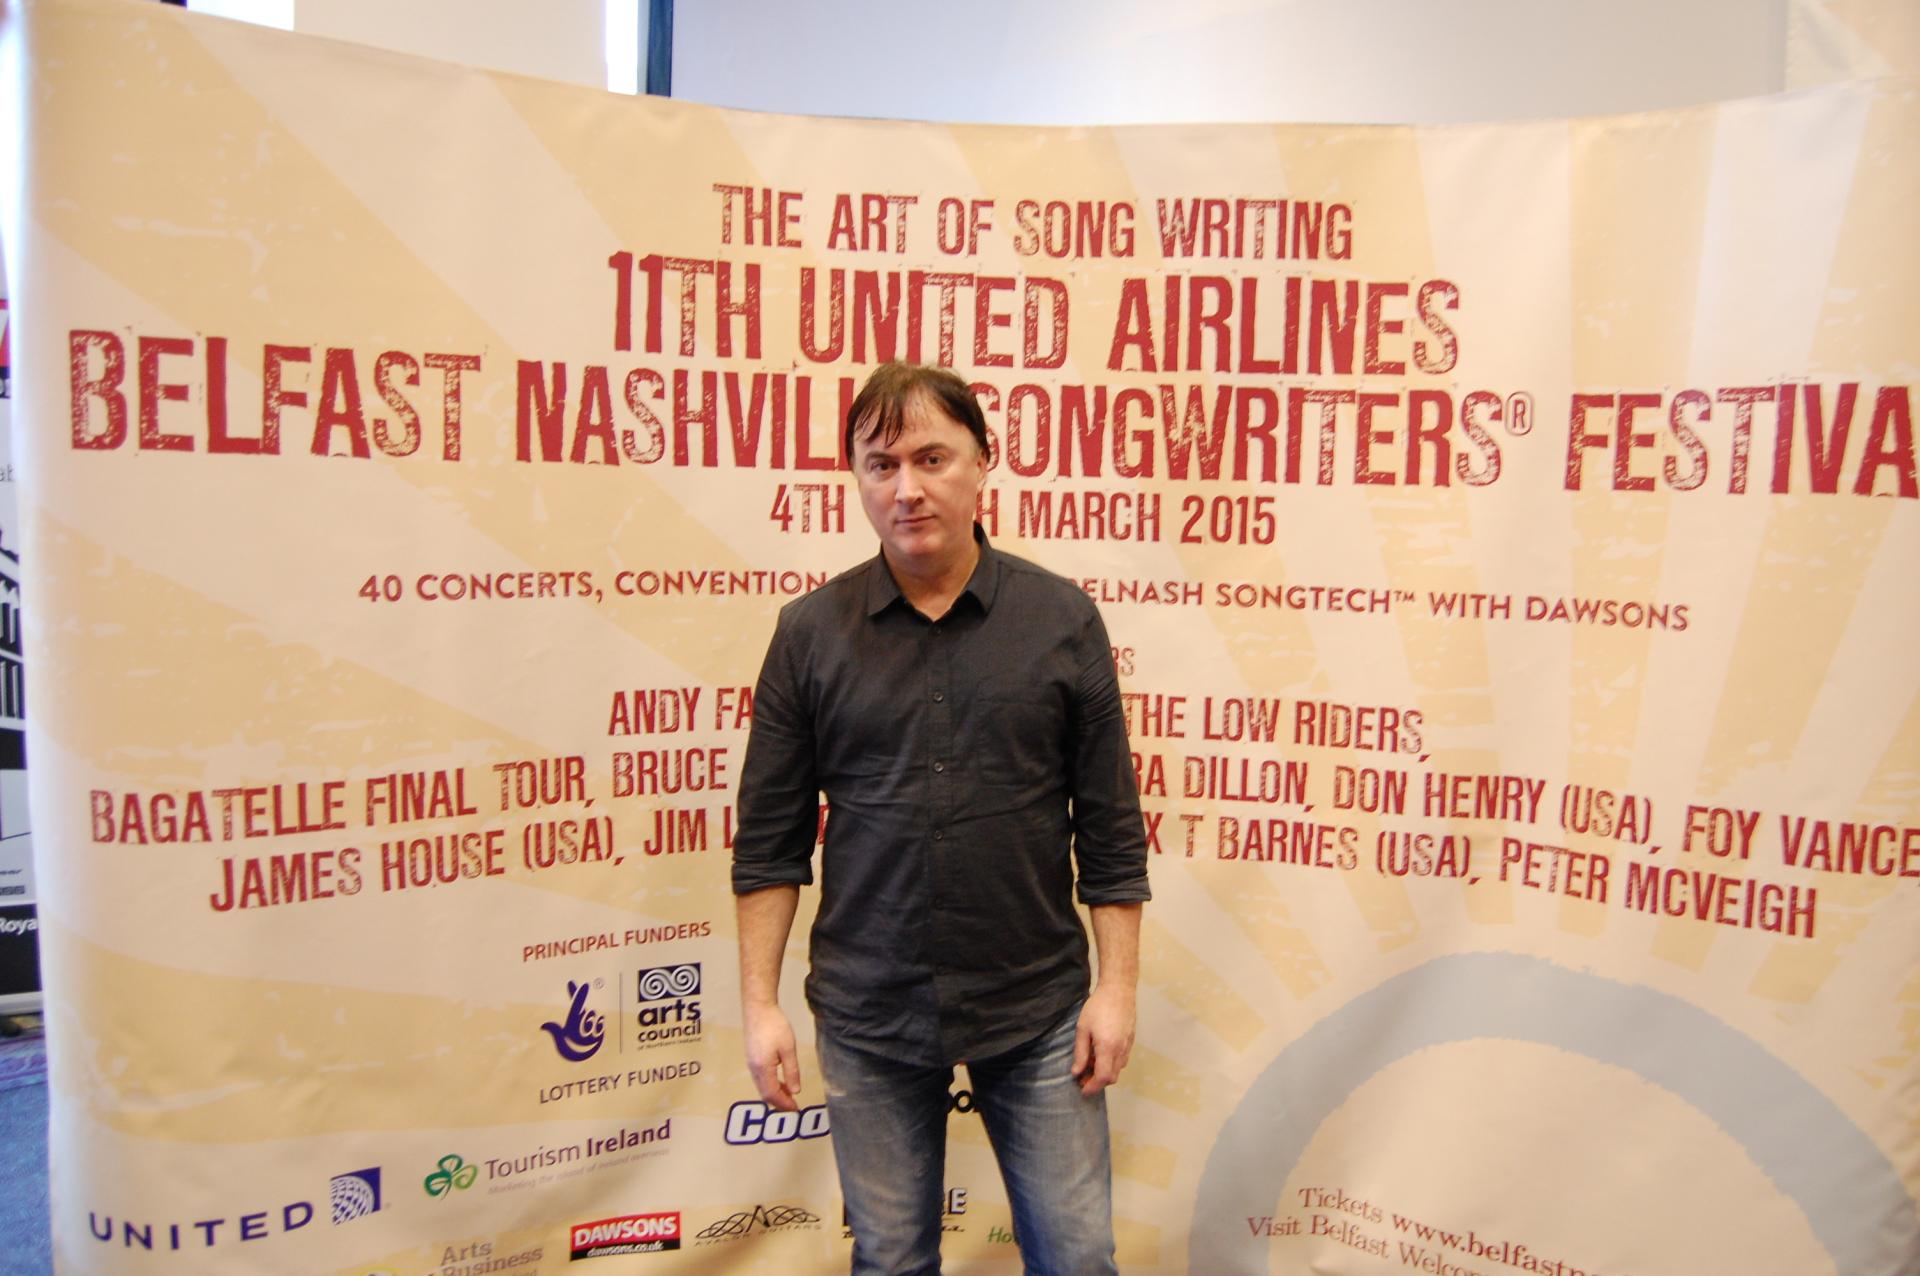 Belfast Nashville Launch 2015